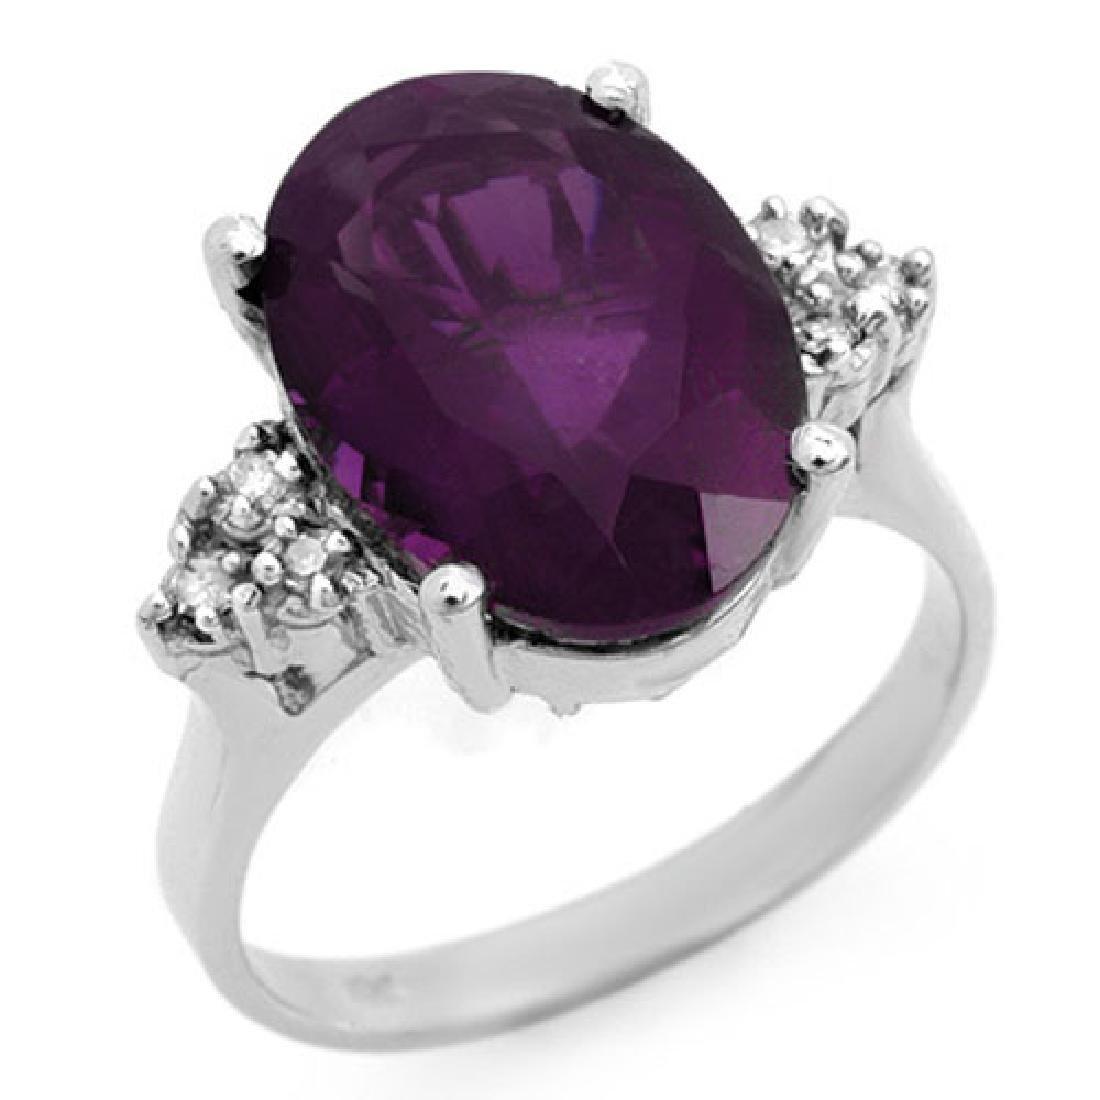 5.15 CTW Amethyst & Diamond Ring 18K White Gold